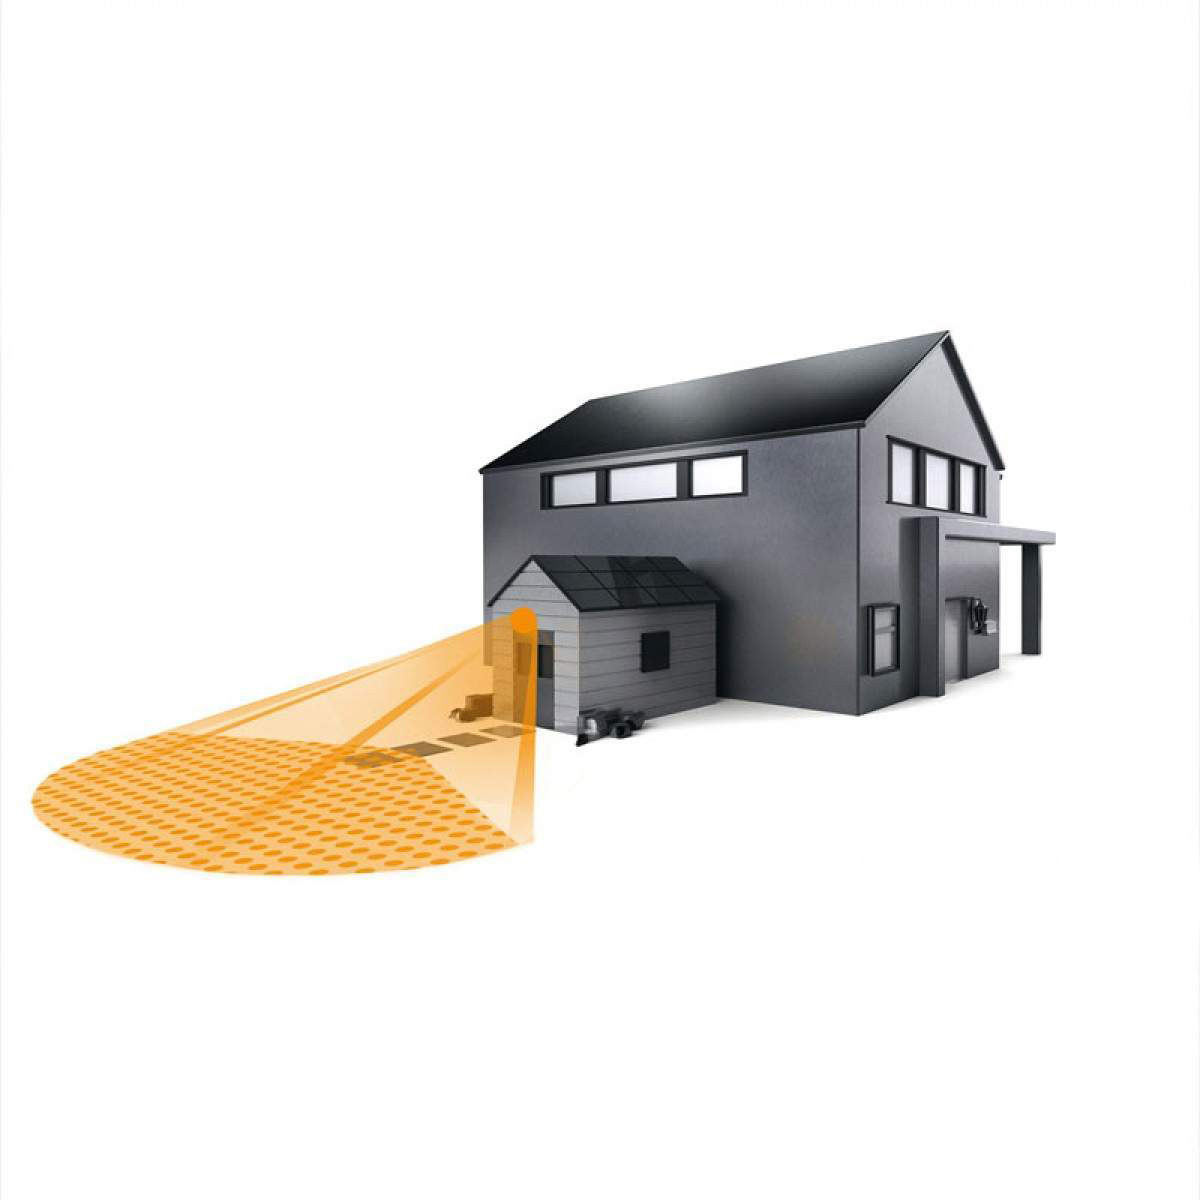 losse sensor buitenlamp - Steinel IS 1 bewegingsmelder zwart (600419) - Steinel - Losse Sensoren en Bewegingsmelders